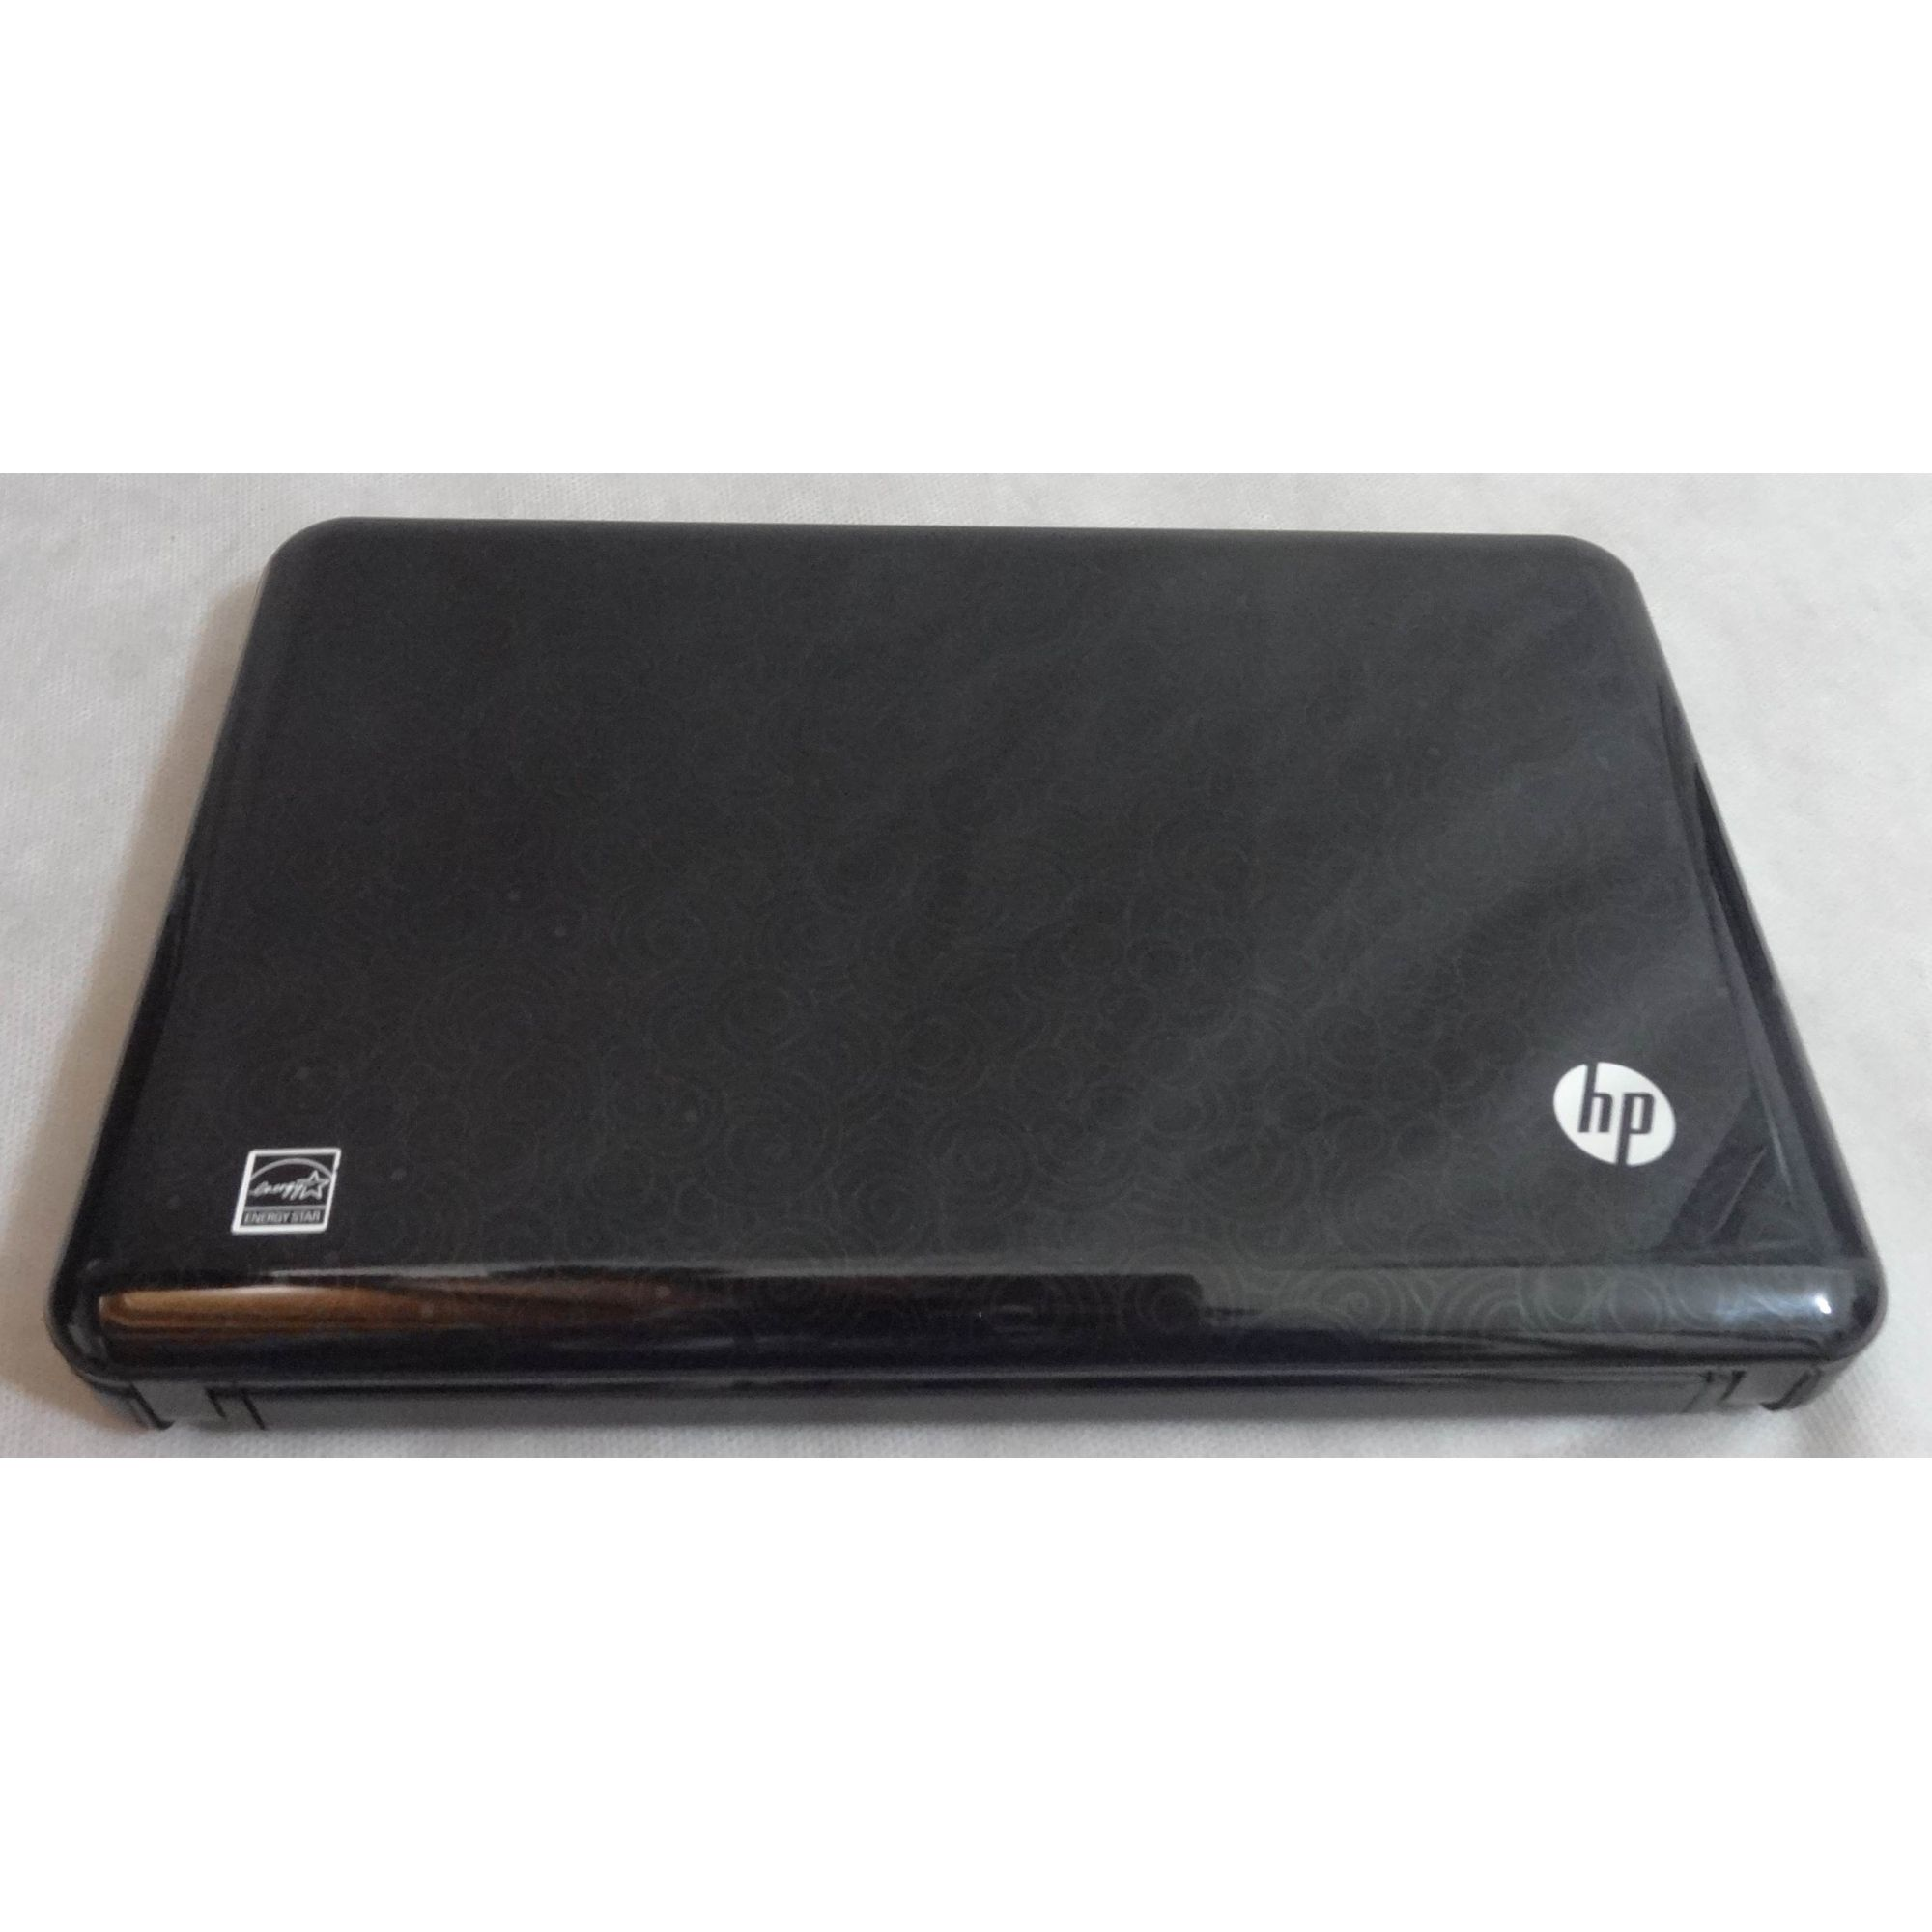 Netbook HP Mini 110-1122BR 10.1'' Intel Atom 1.60 Ghz 2GB HD 250GB ( Não enviamos )